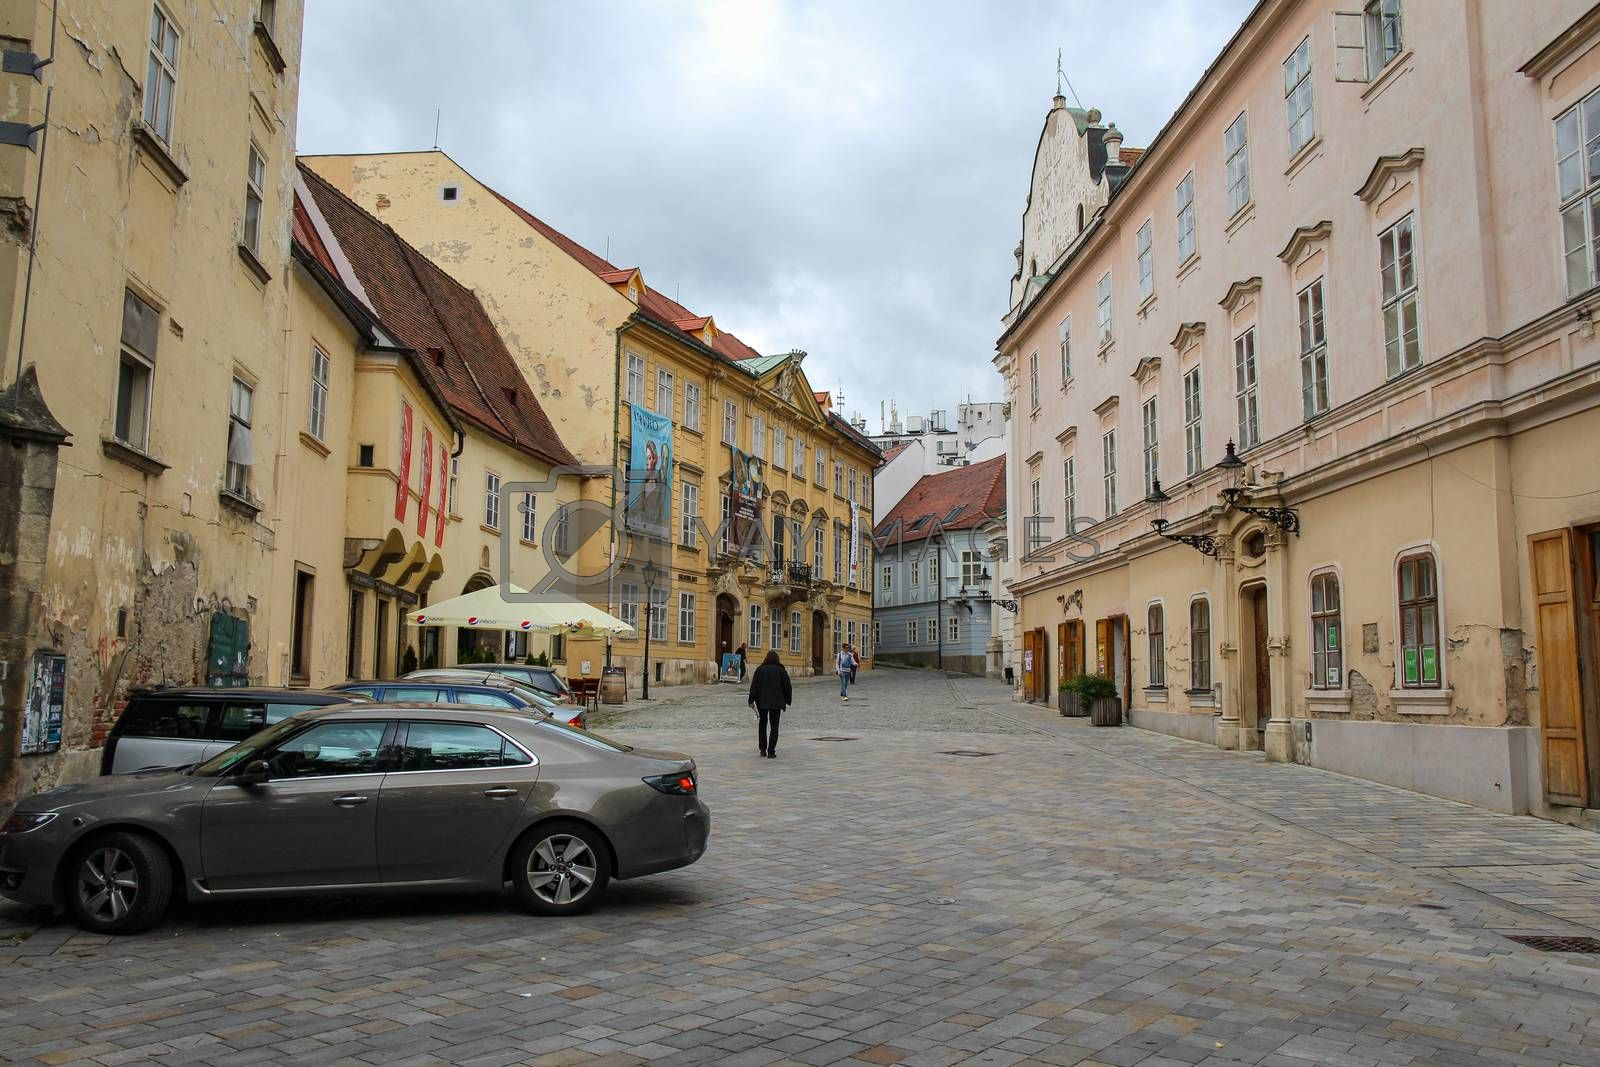 Bratislava, Slovakia - July 5th 2020: Frantiskanske namestie street at the church of the annunciation, old town Bratislava, Slovakia